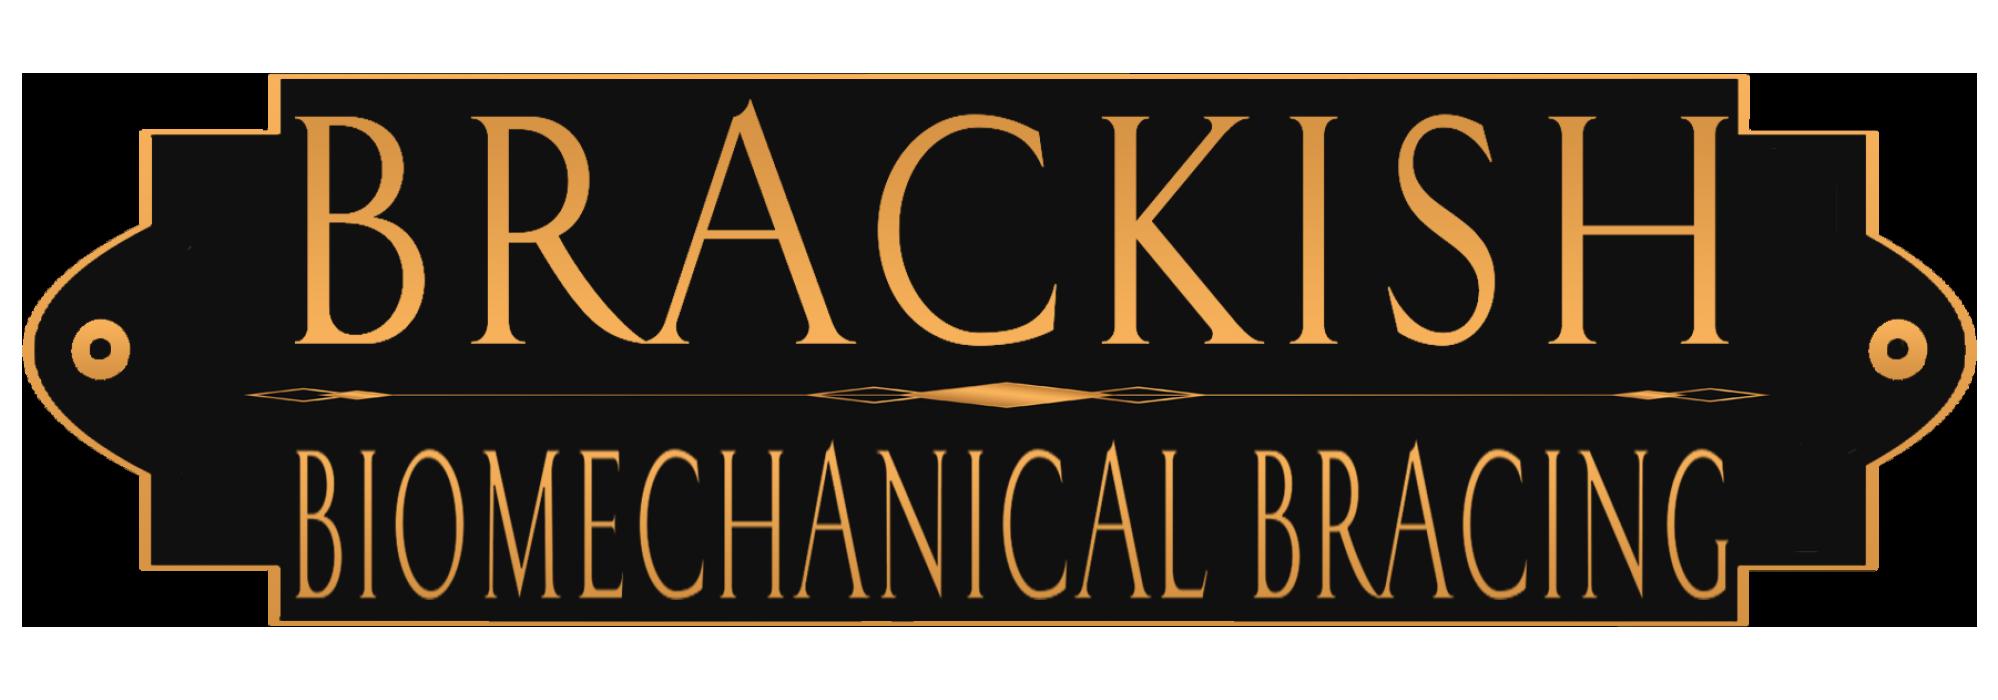 Brackish Bracing